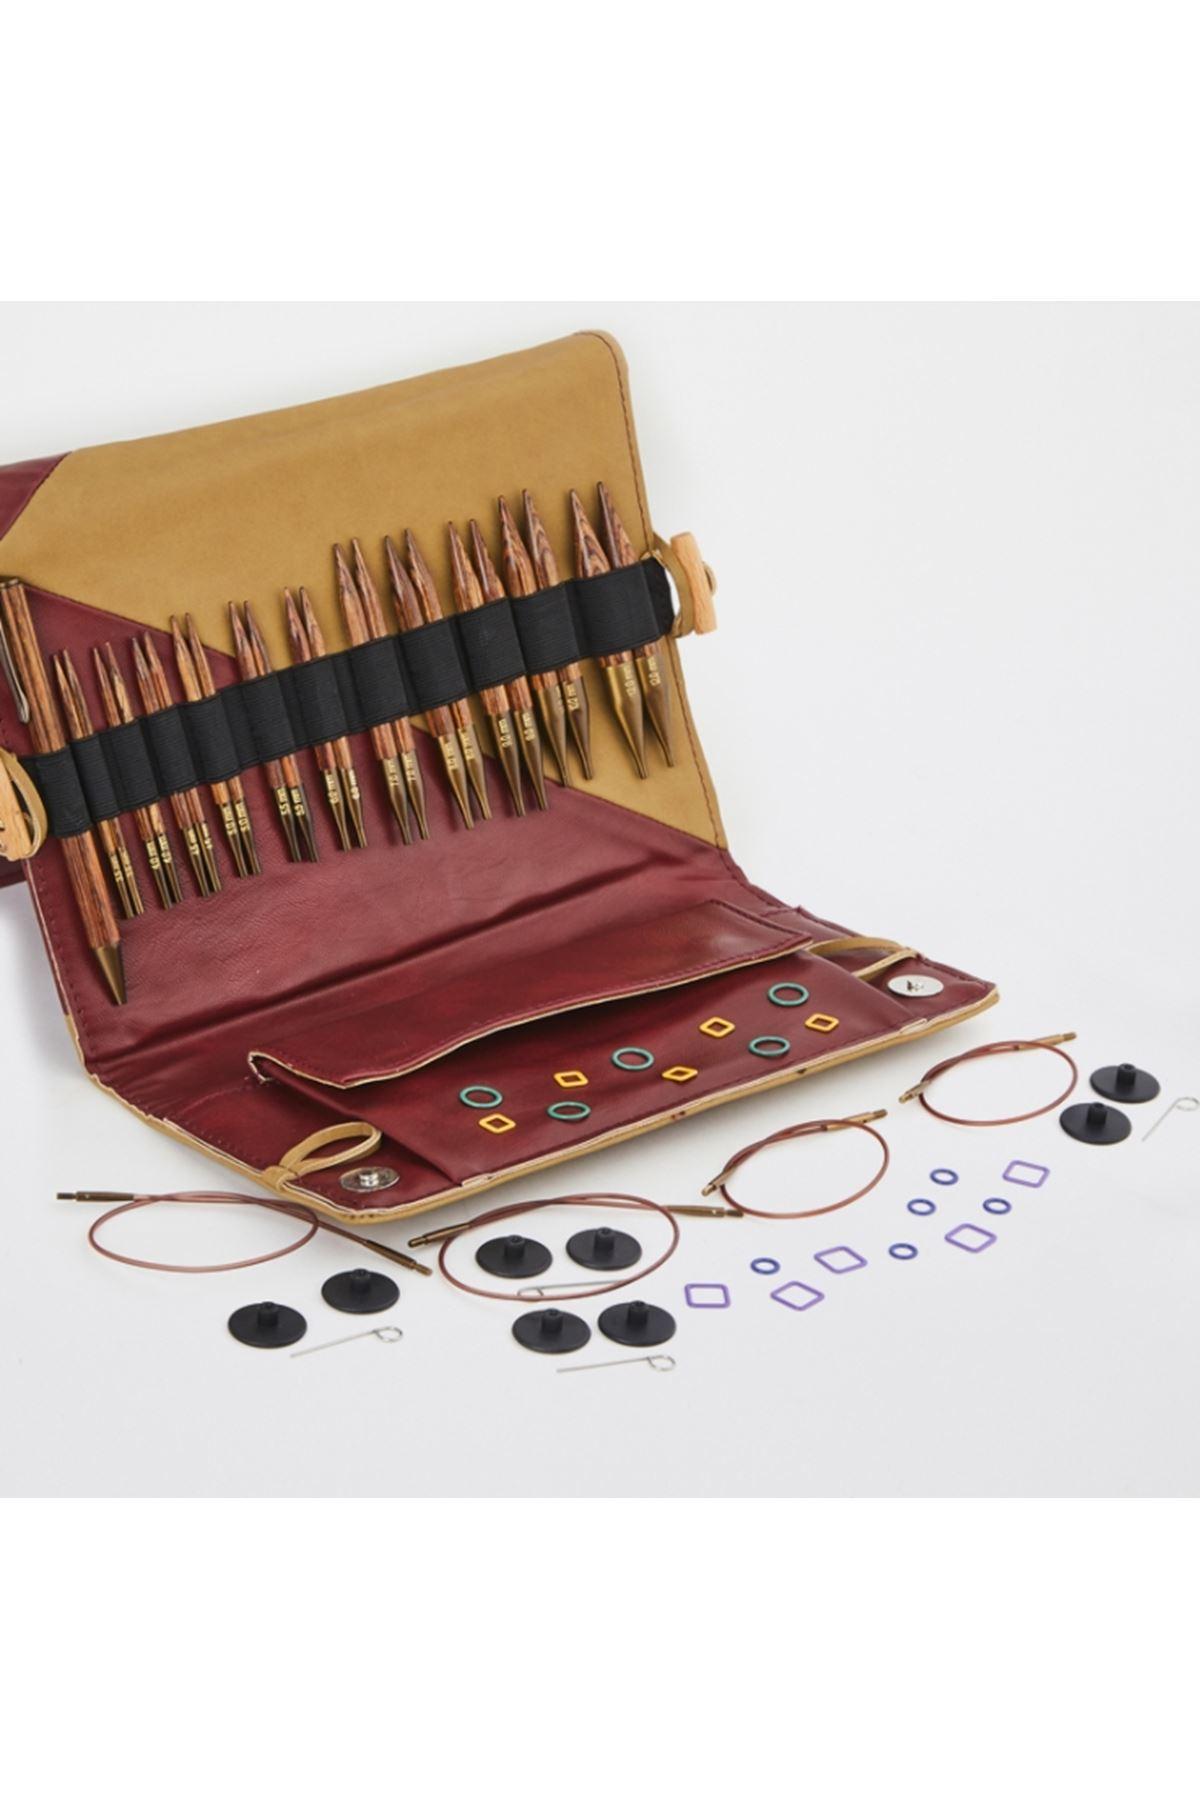 Knit Pro Ginger Special Misinalı Şiş Örgü Seti